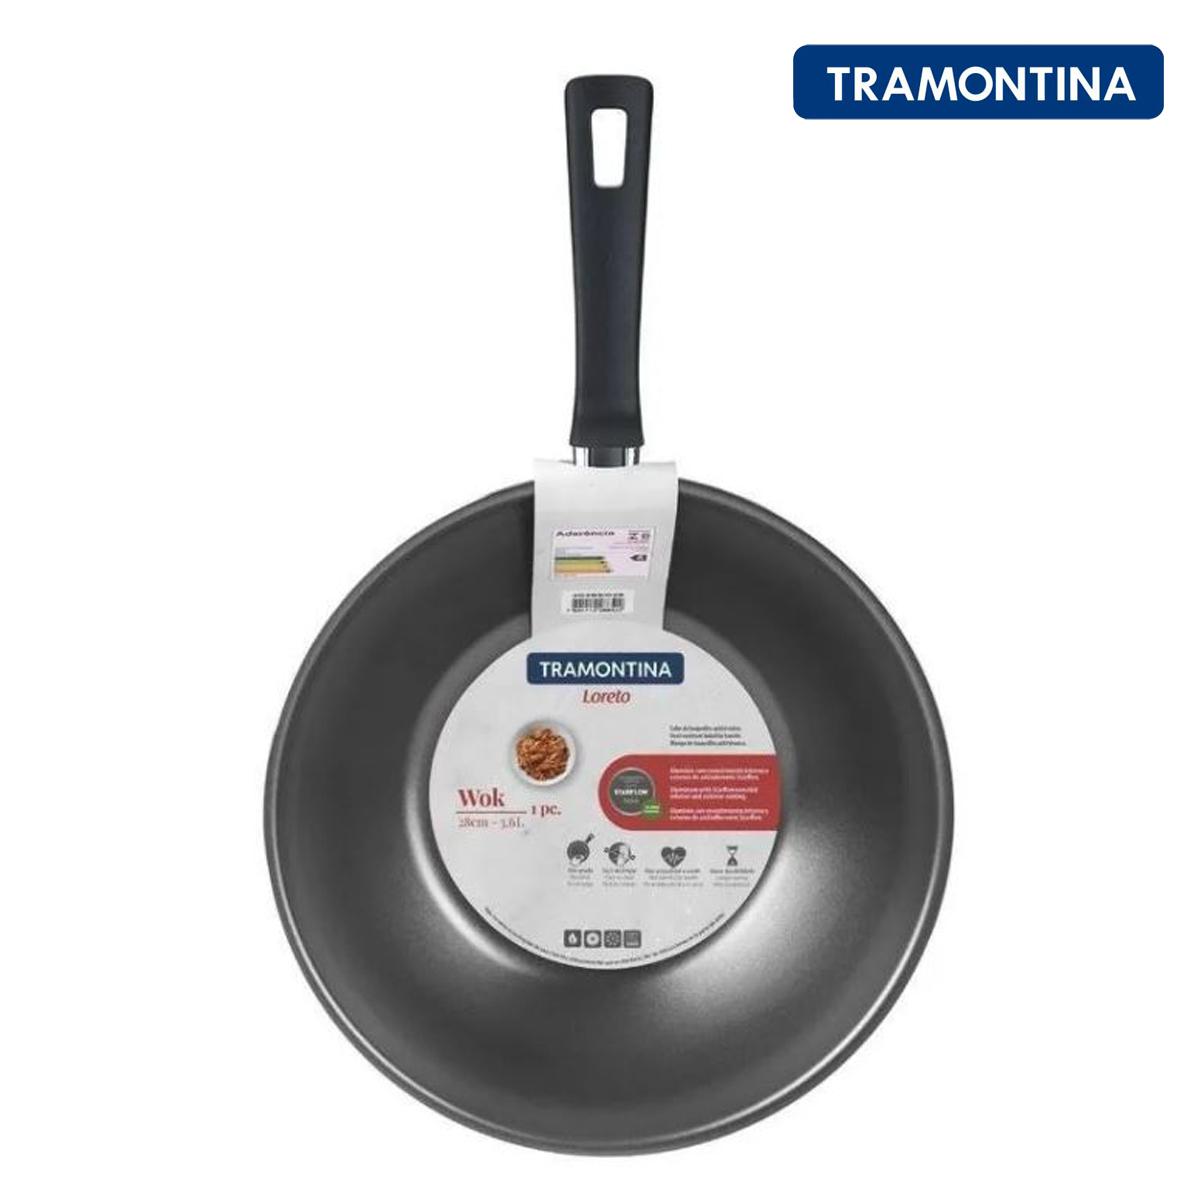 Frigideira Wok Tramontina Loreto C/ Revestimento Antiaderente Starflon Max Vermelho